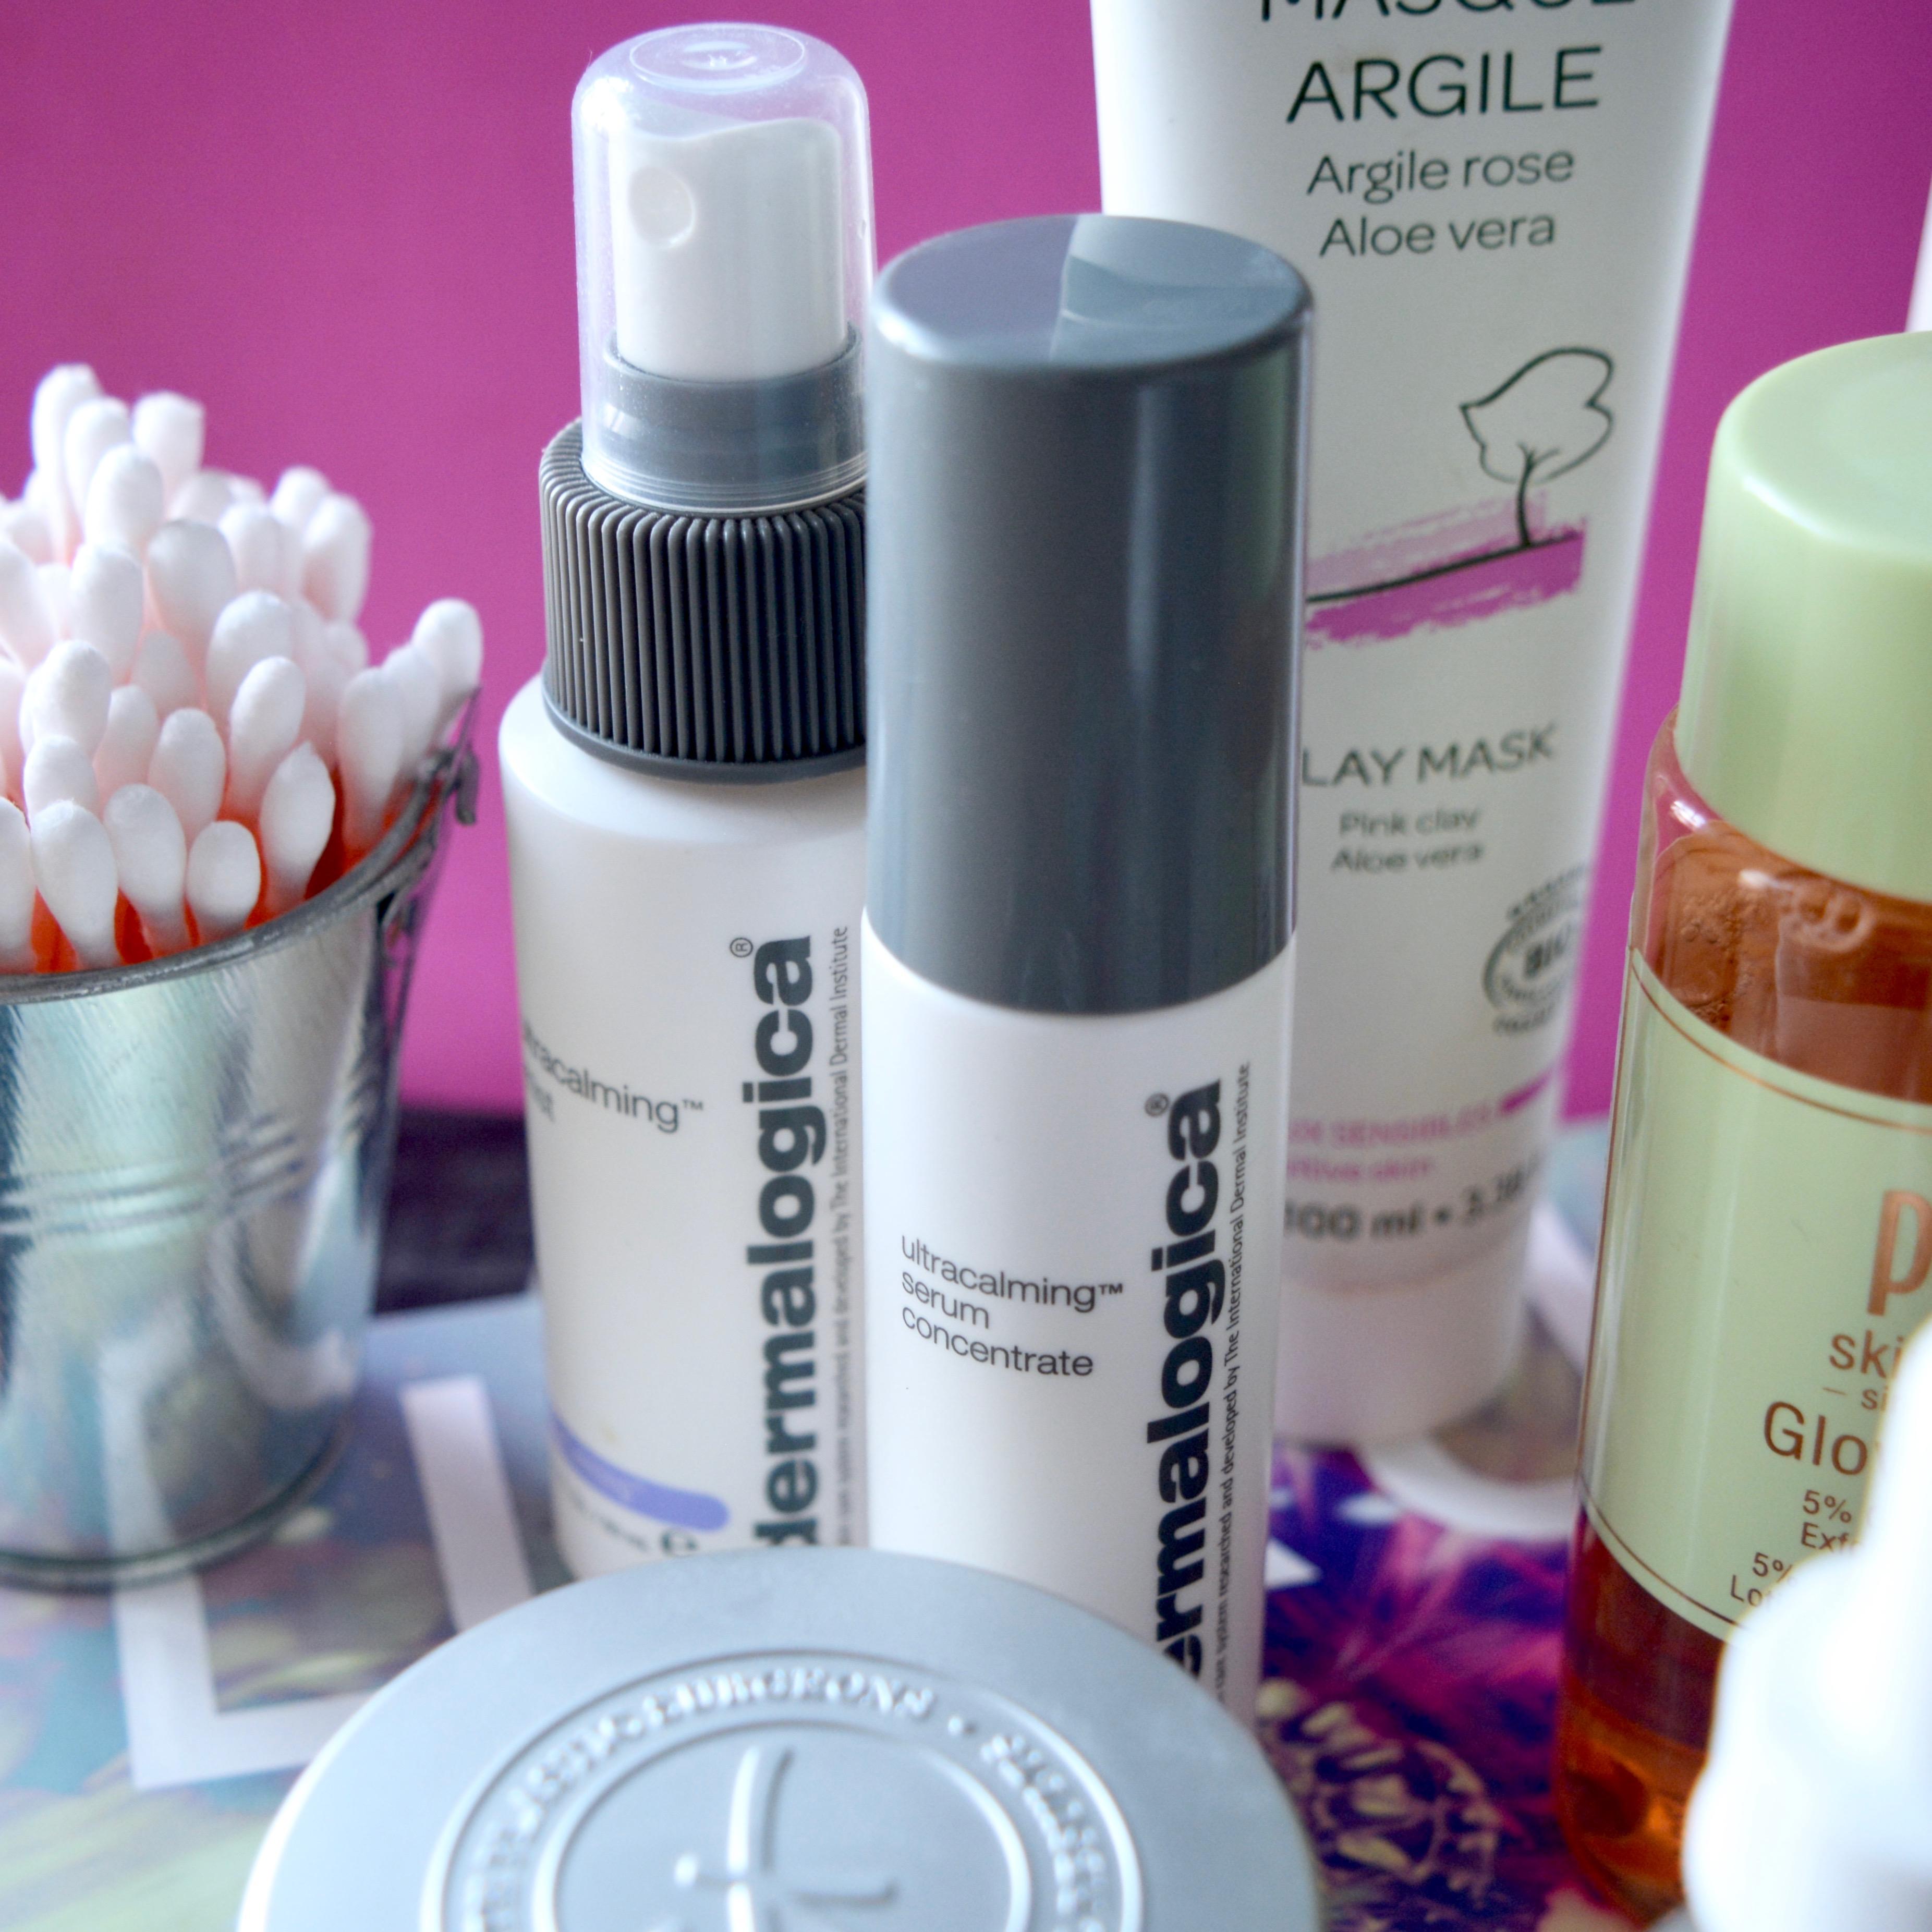 Skincare Shake Up October 2017 - Dermalogica Ultracalming range (full skincare routine for sensitive/rosacea skin)